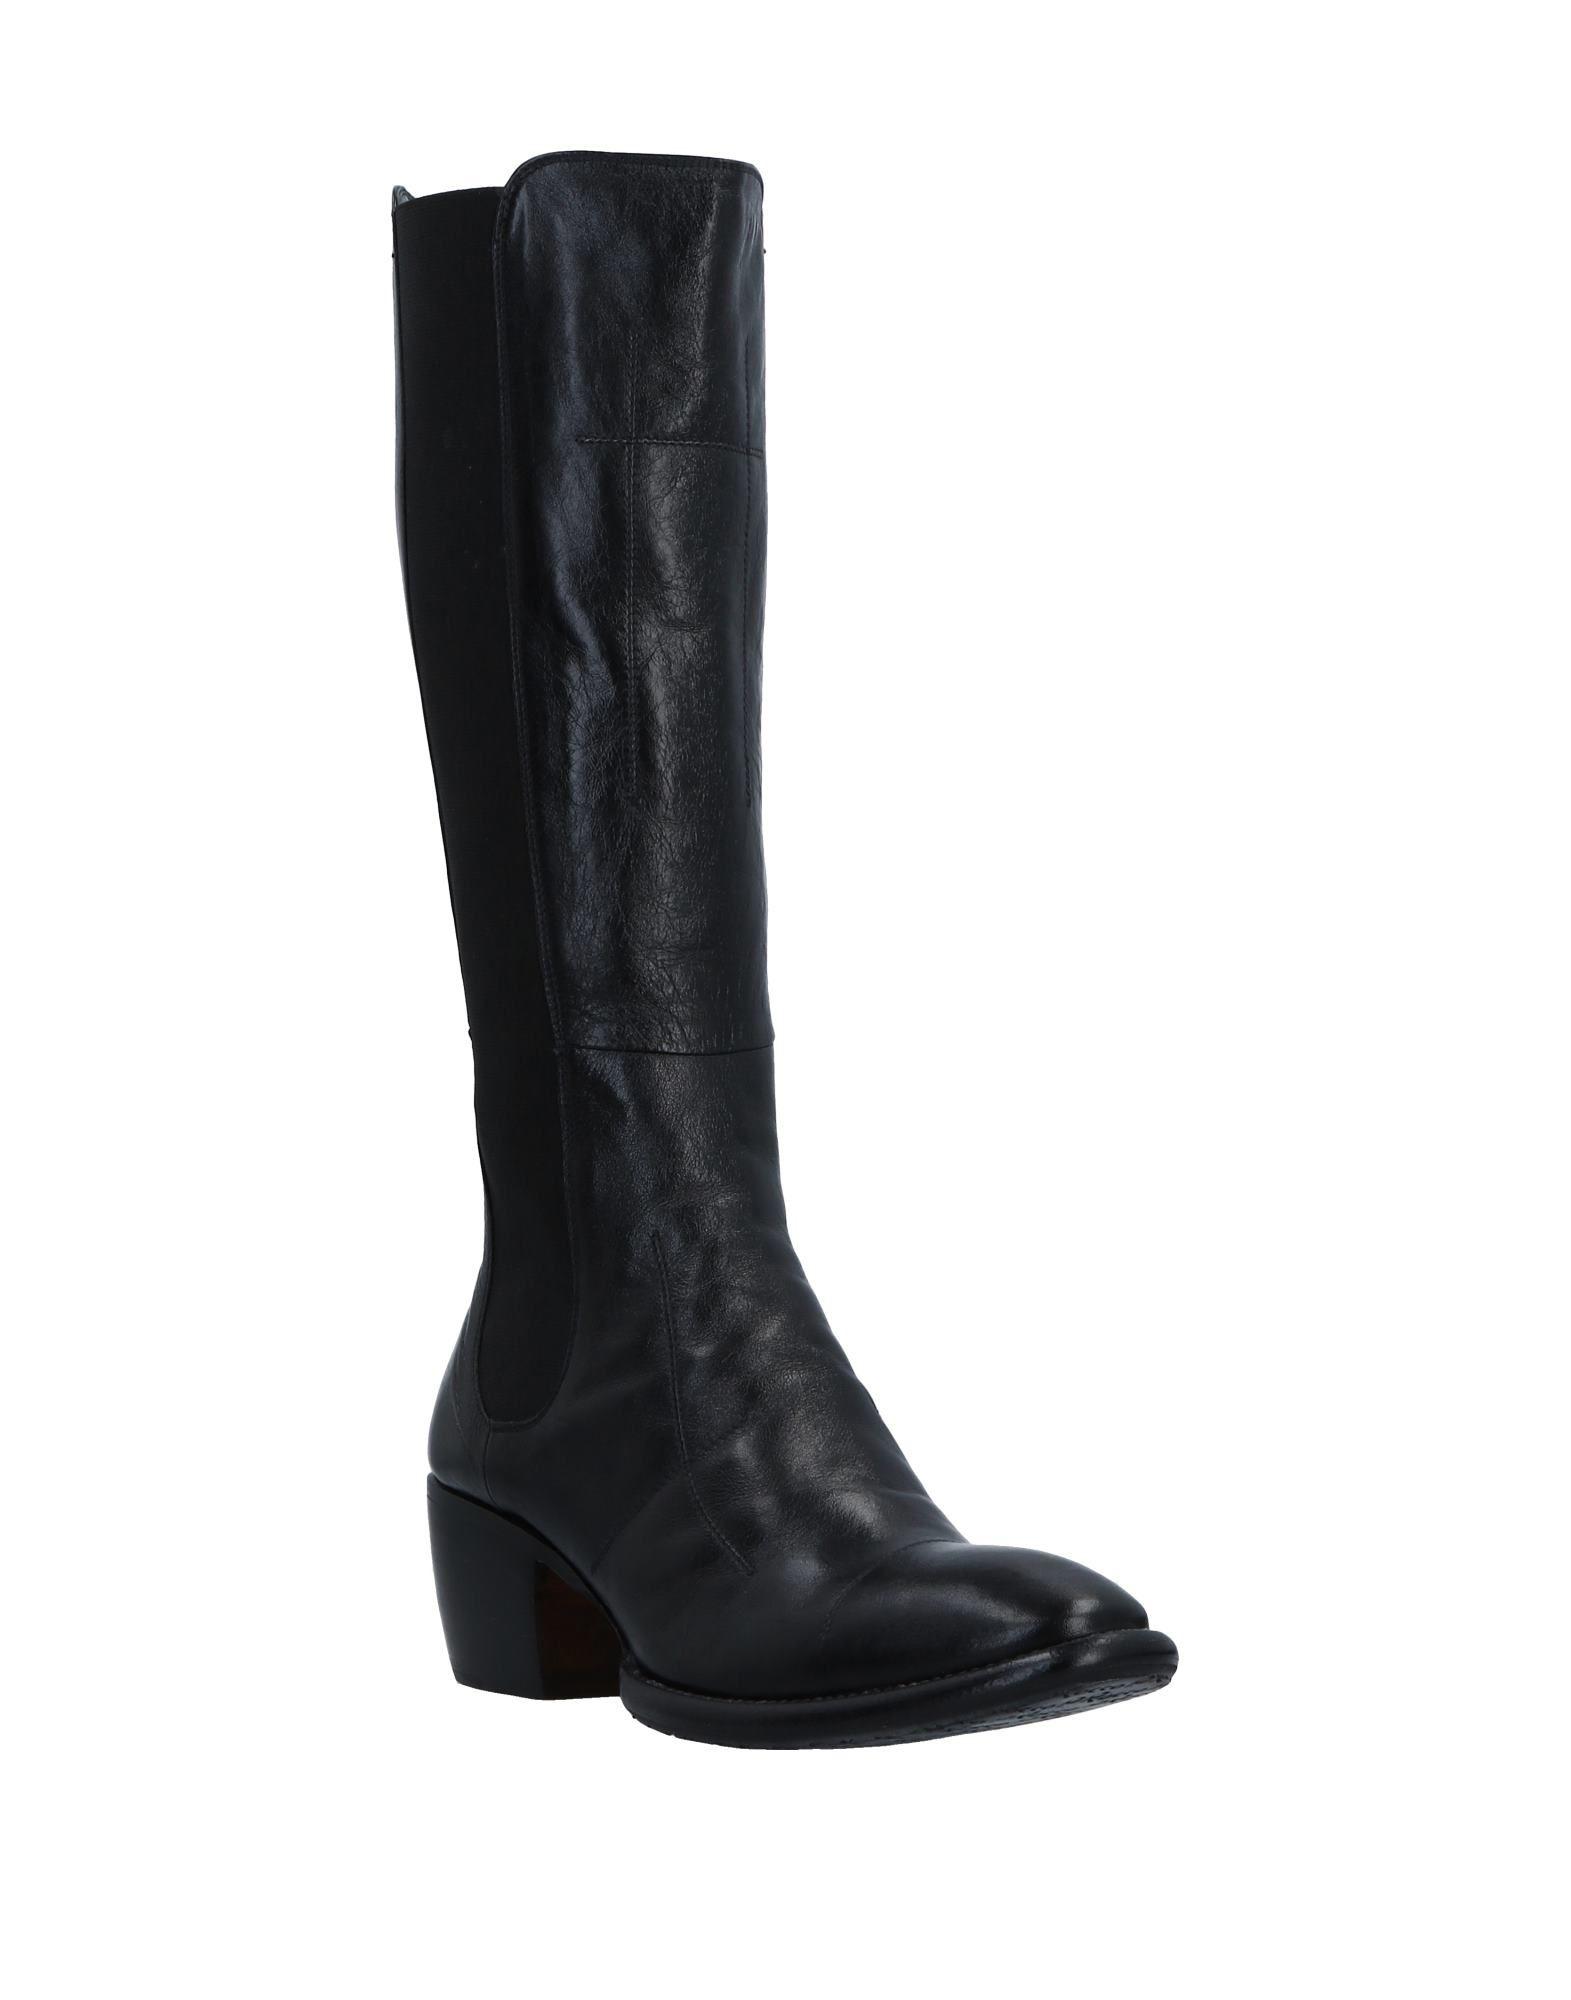 Rocco P. Stiefel Damen  11514249ID Beliebte Beliebte Beliebte Schuhe 3e7d23